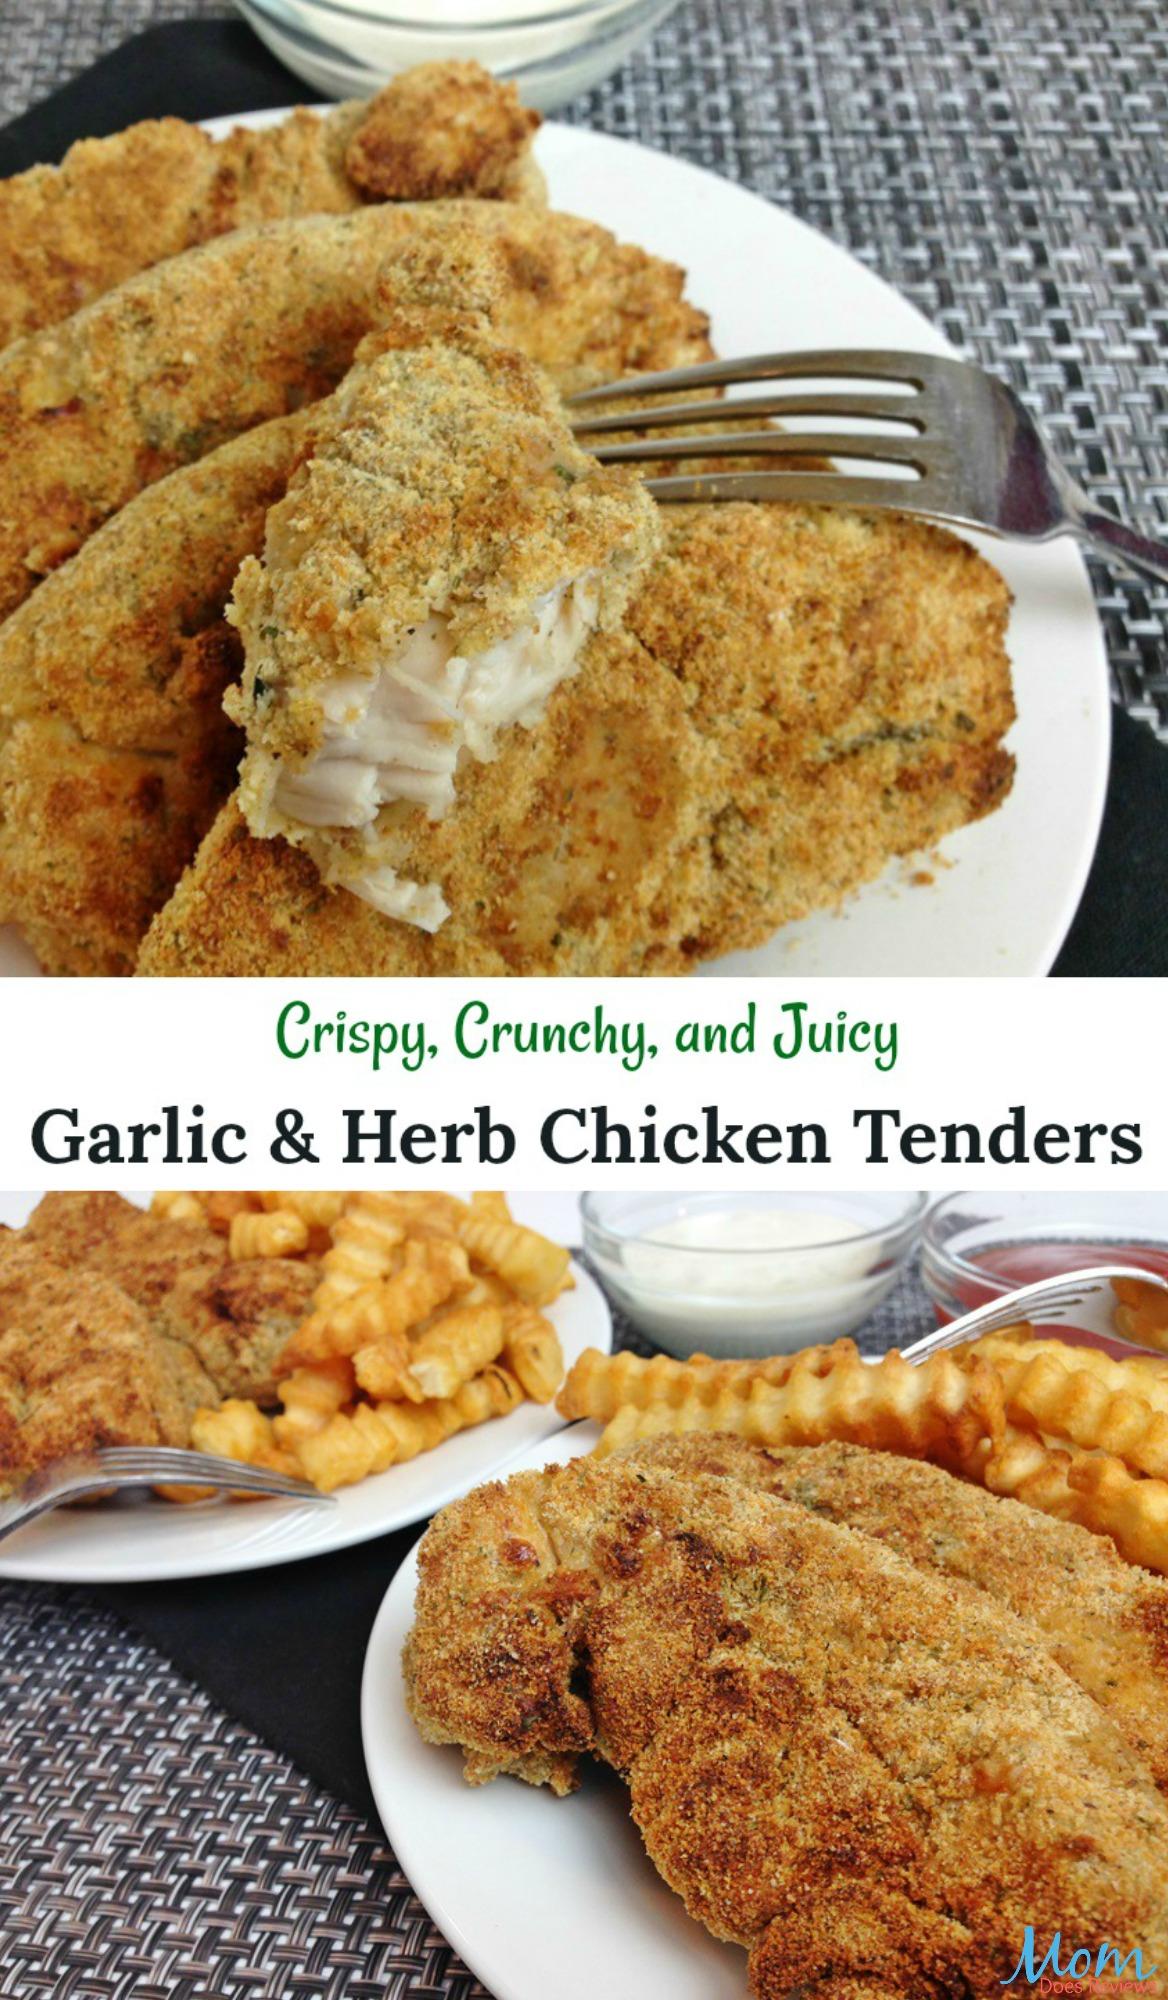 Garlic and Herb Chicken Tenders Recipe